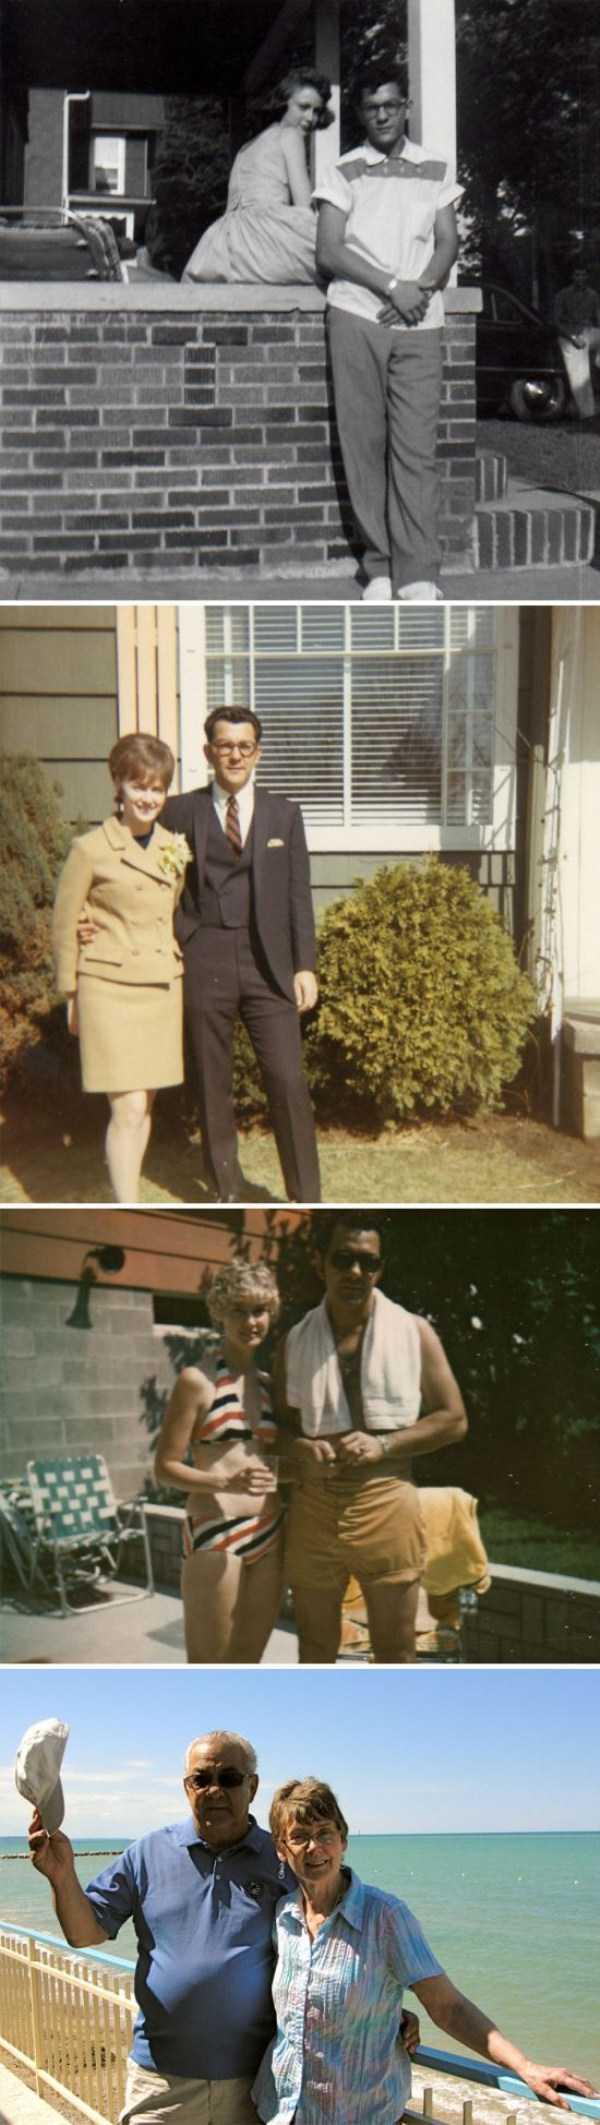 then-now-couple-pics (19)